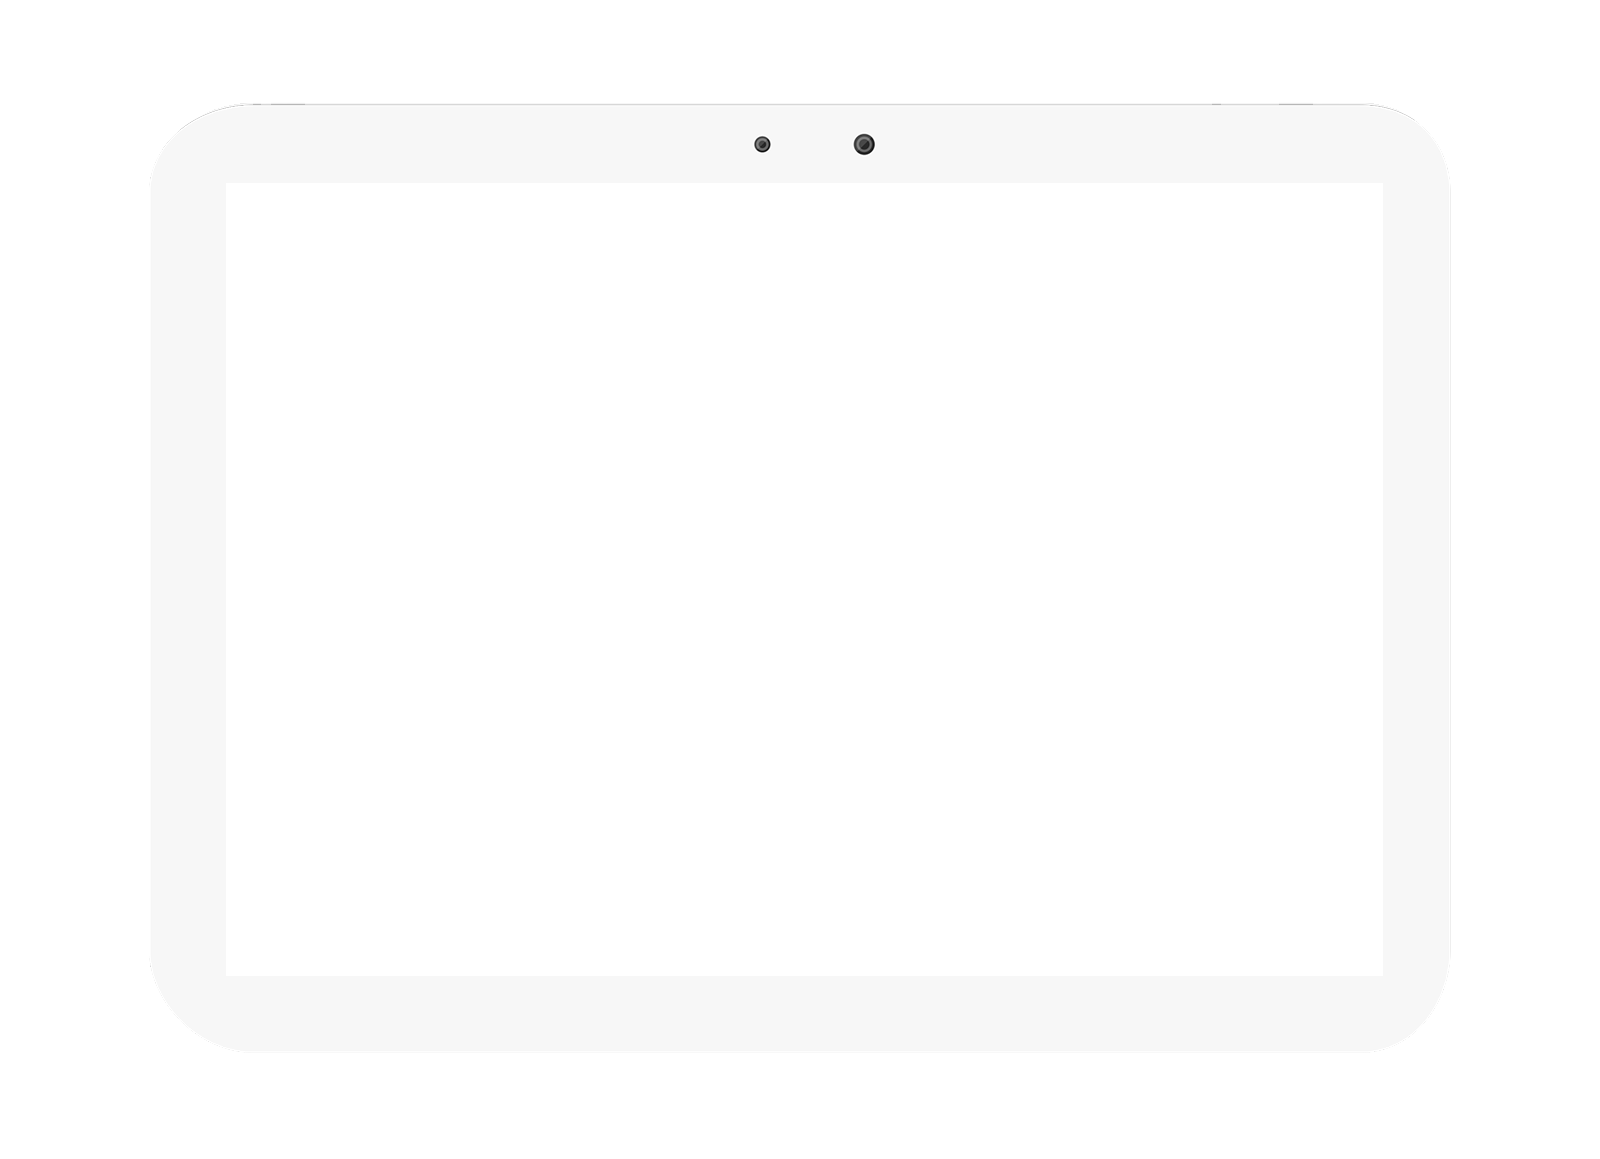 application on ipad